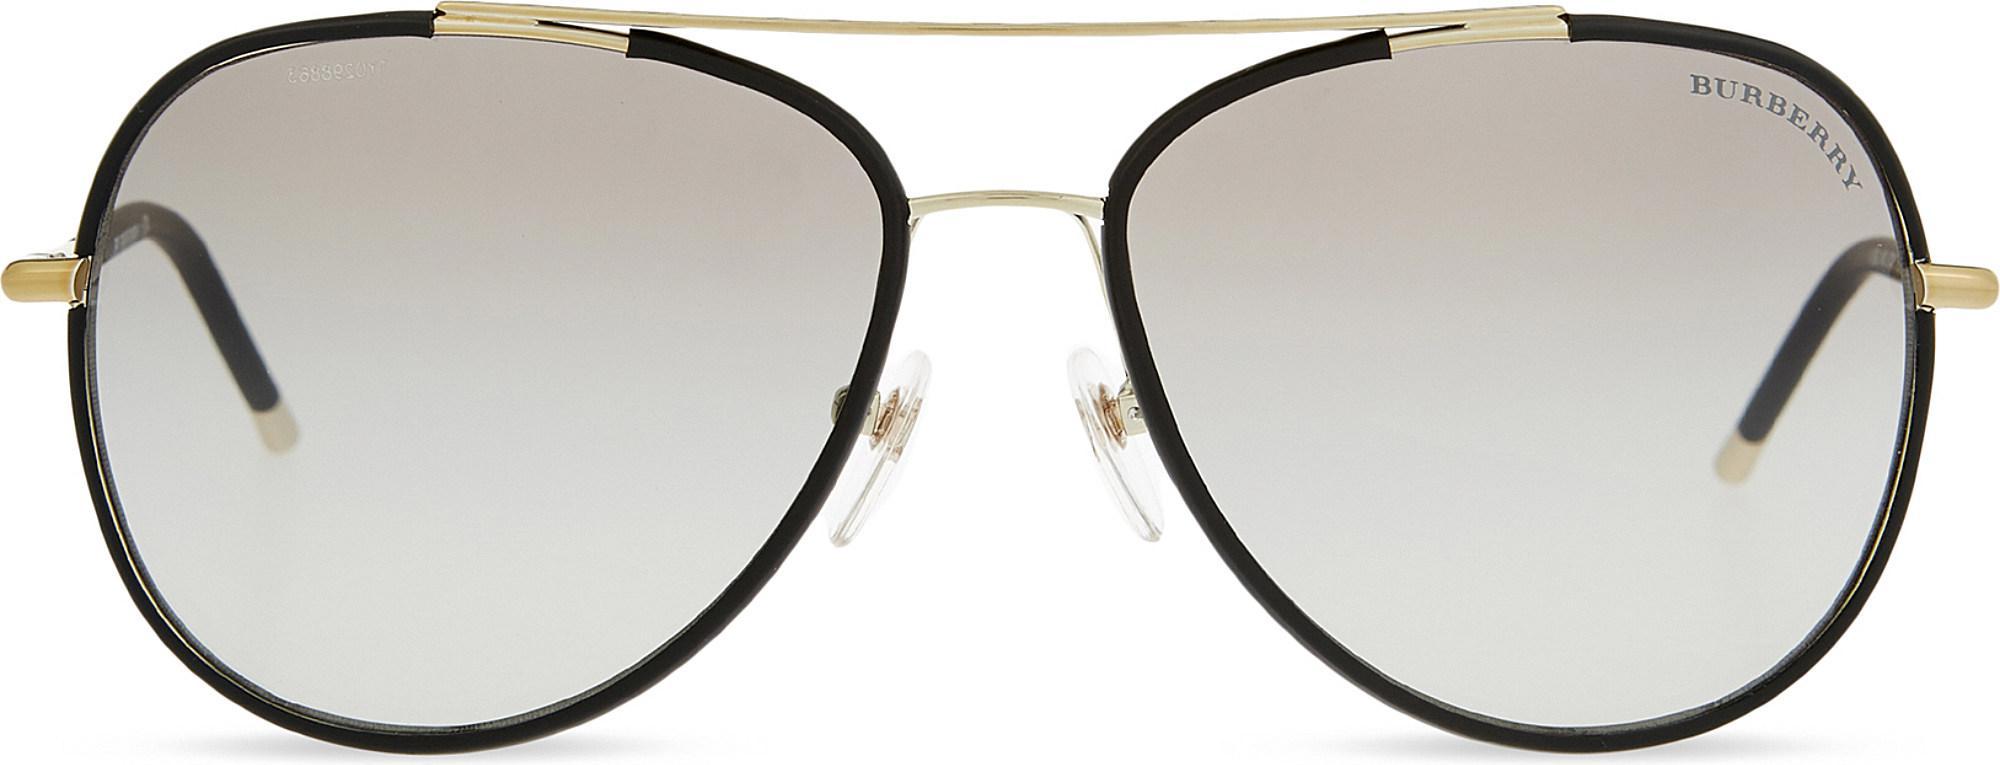 4d30f75a15a Lyst - Burberry B3078j Aviator Sunglasses